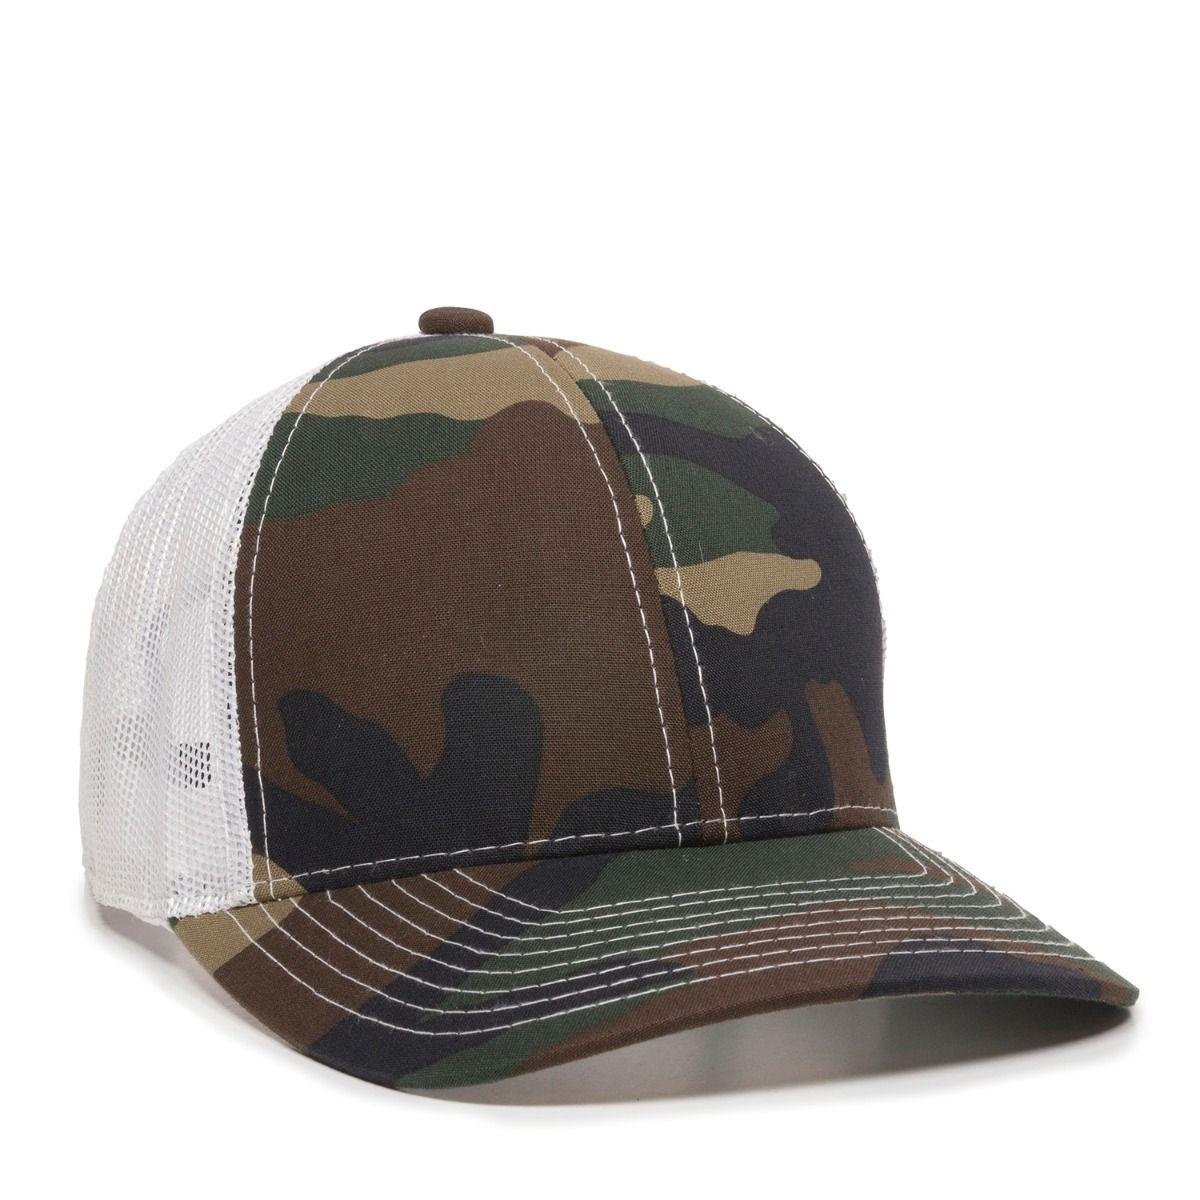 89cd16a3 MBW-800GC   Outdoor Cap - Team Headwear